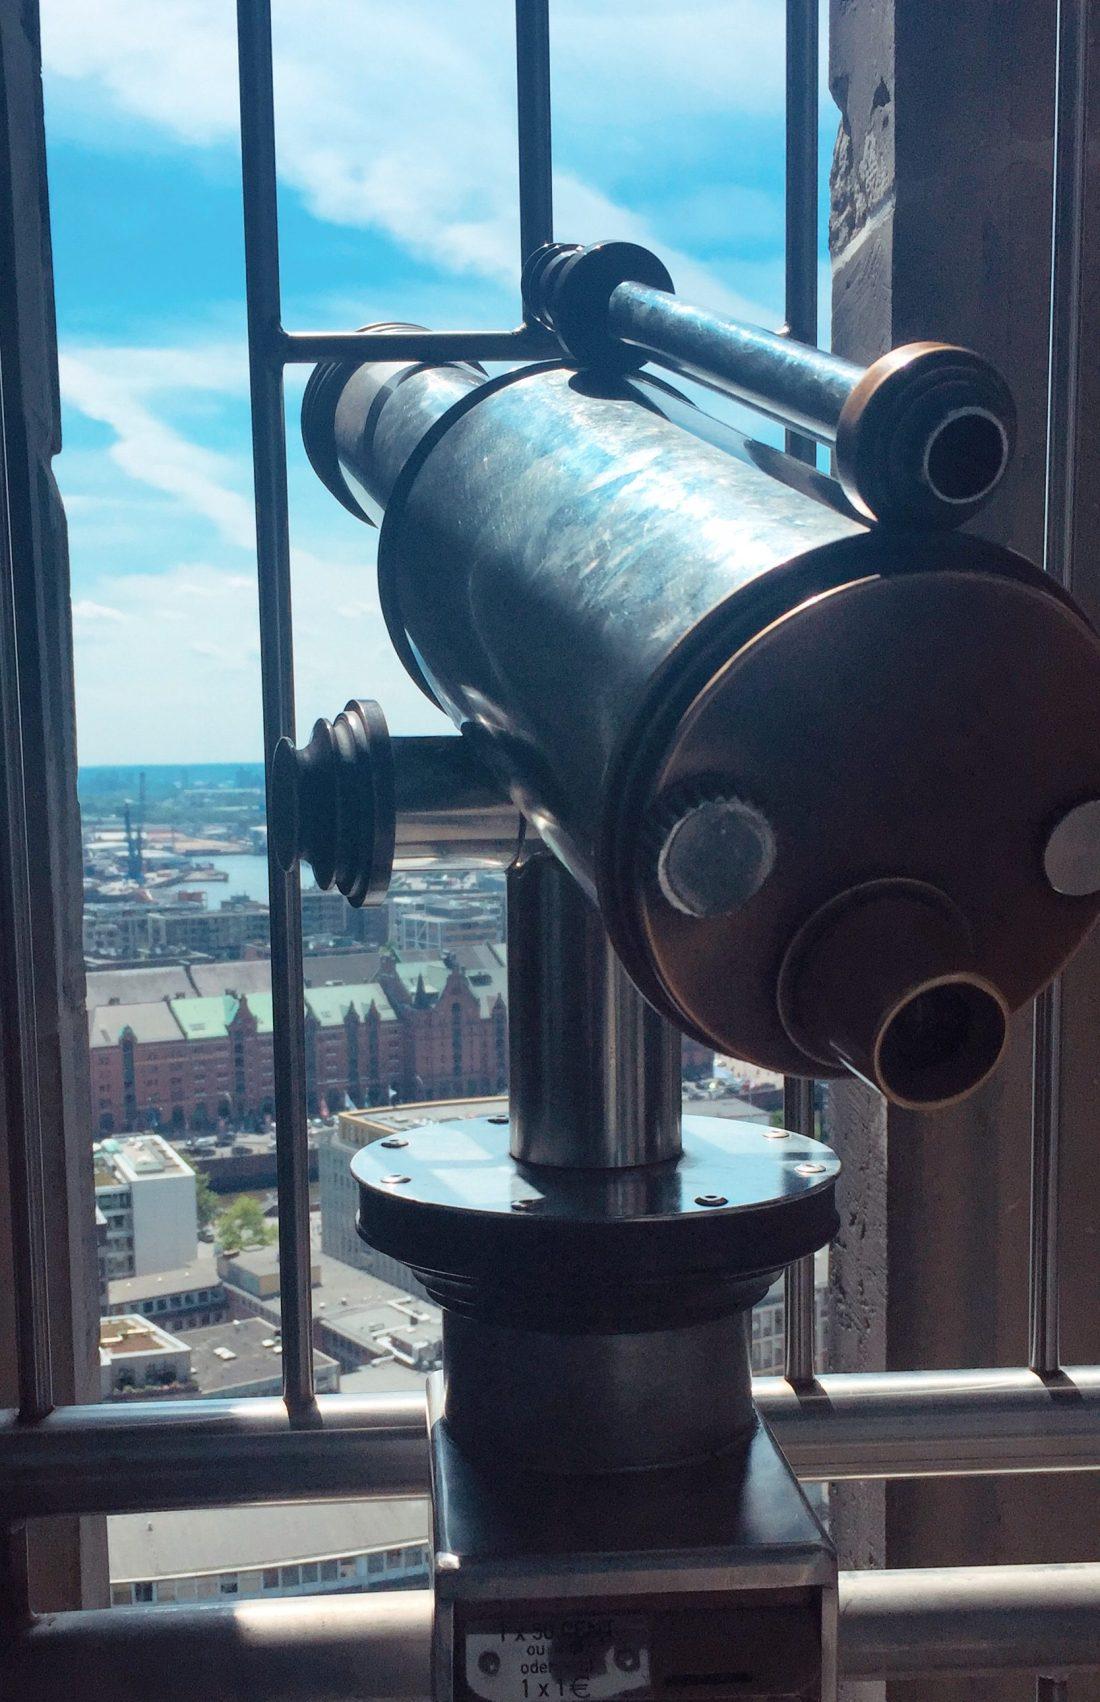 Planning Hamburg city breaks